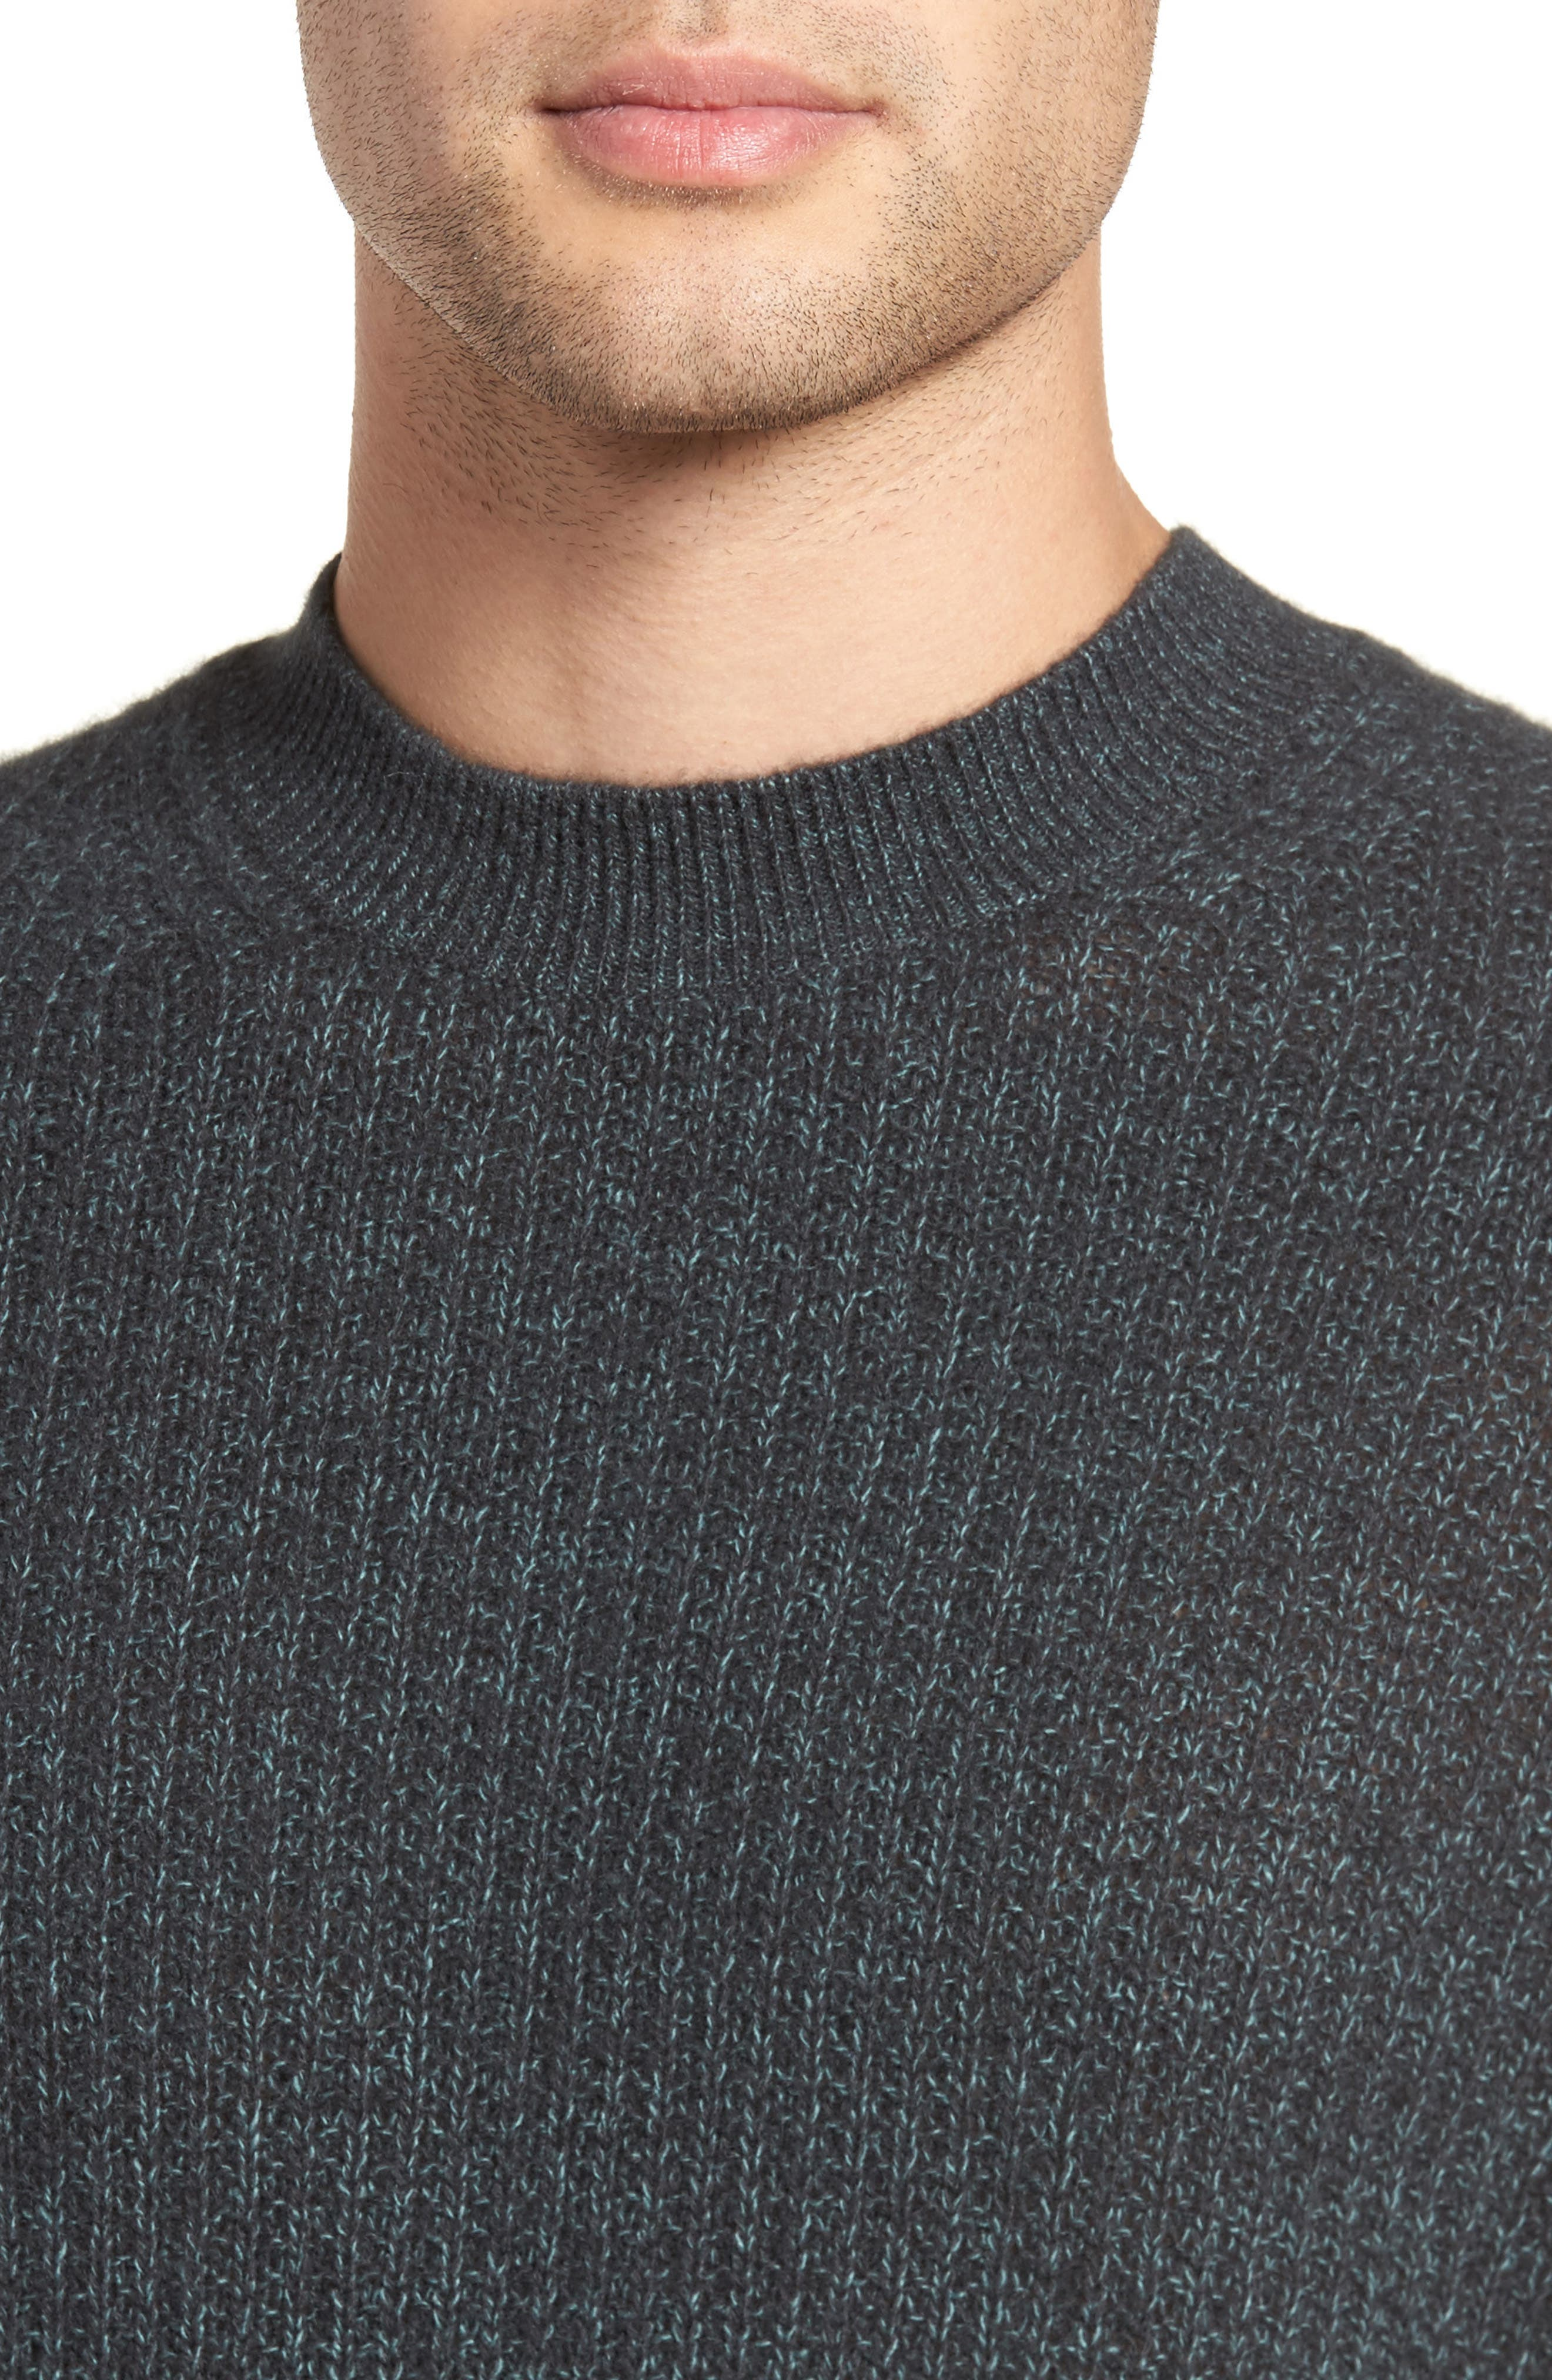 Thermal Knit Crewneck Cashmere Sweater,                             Alternate thumbnail 4, color,                             Beetle/ Mint